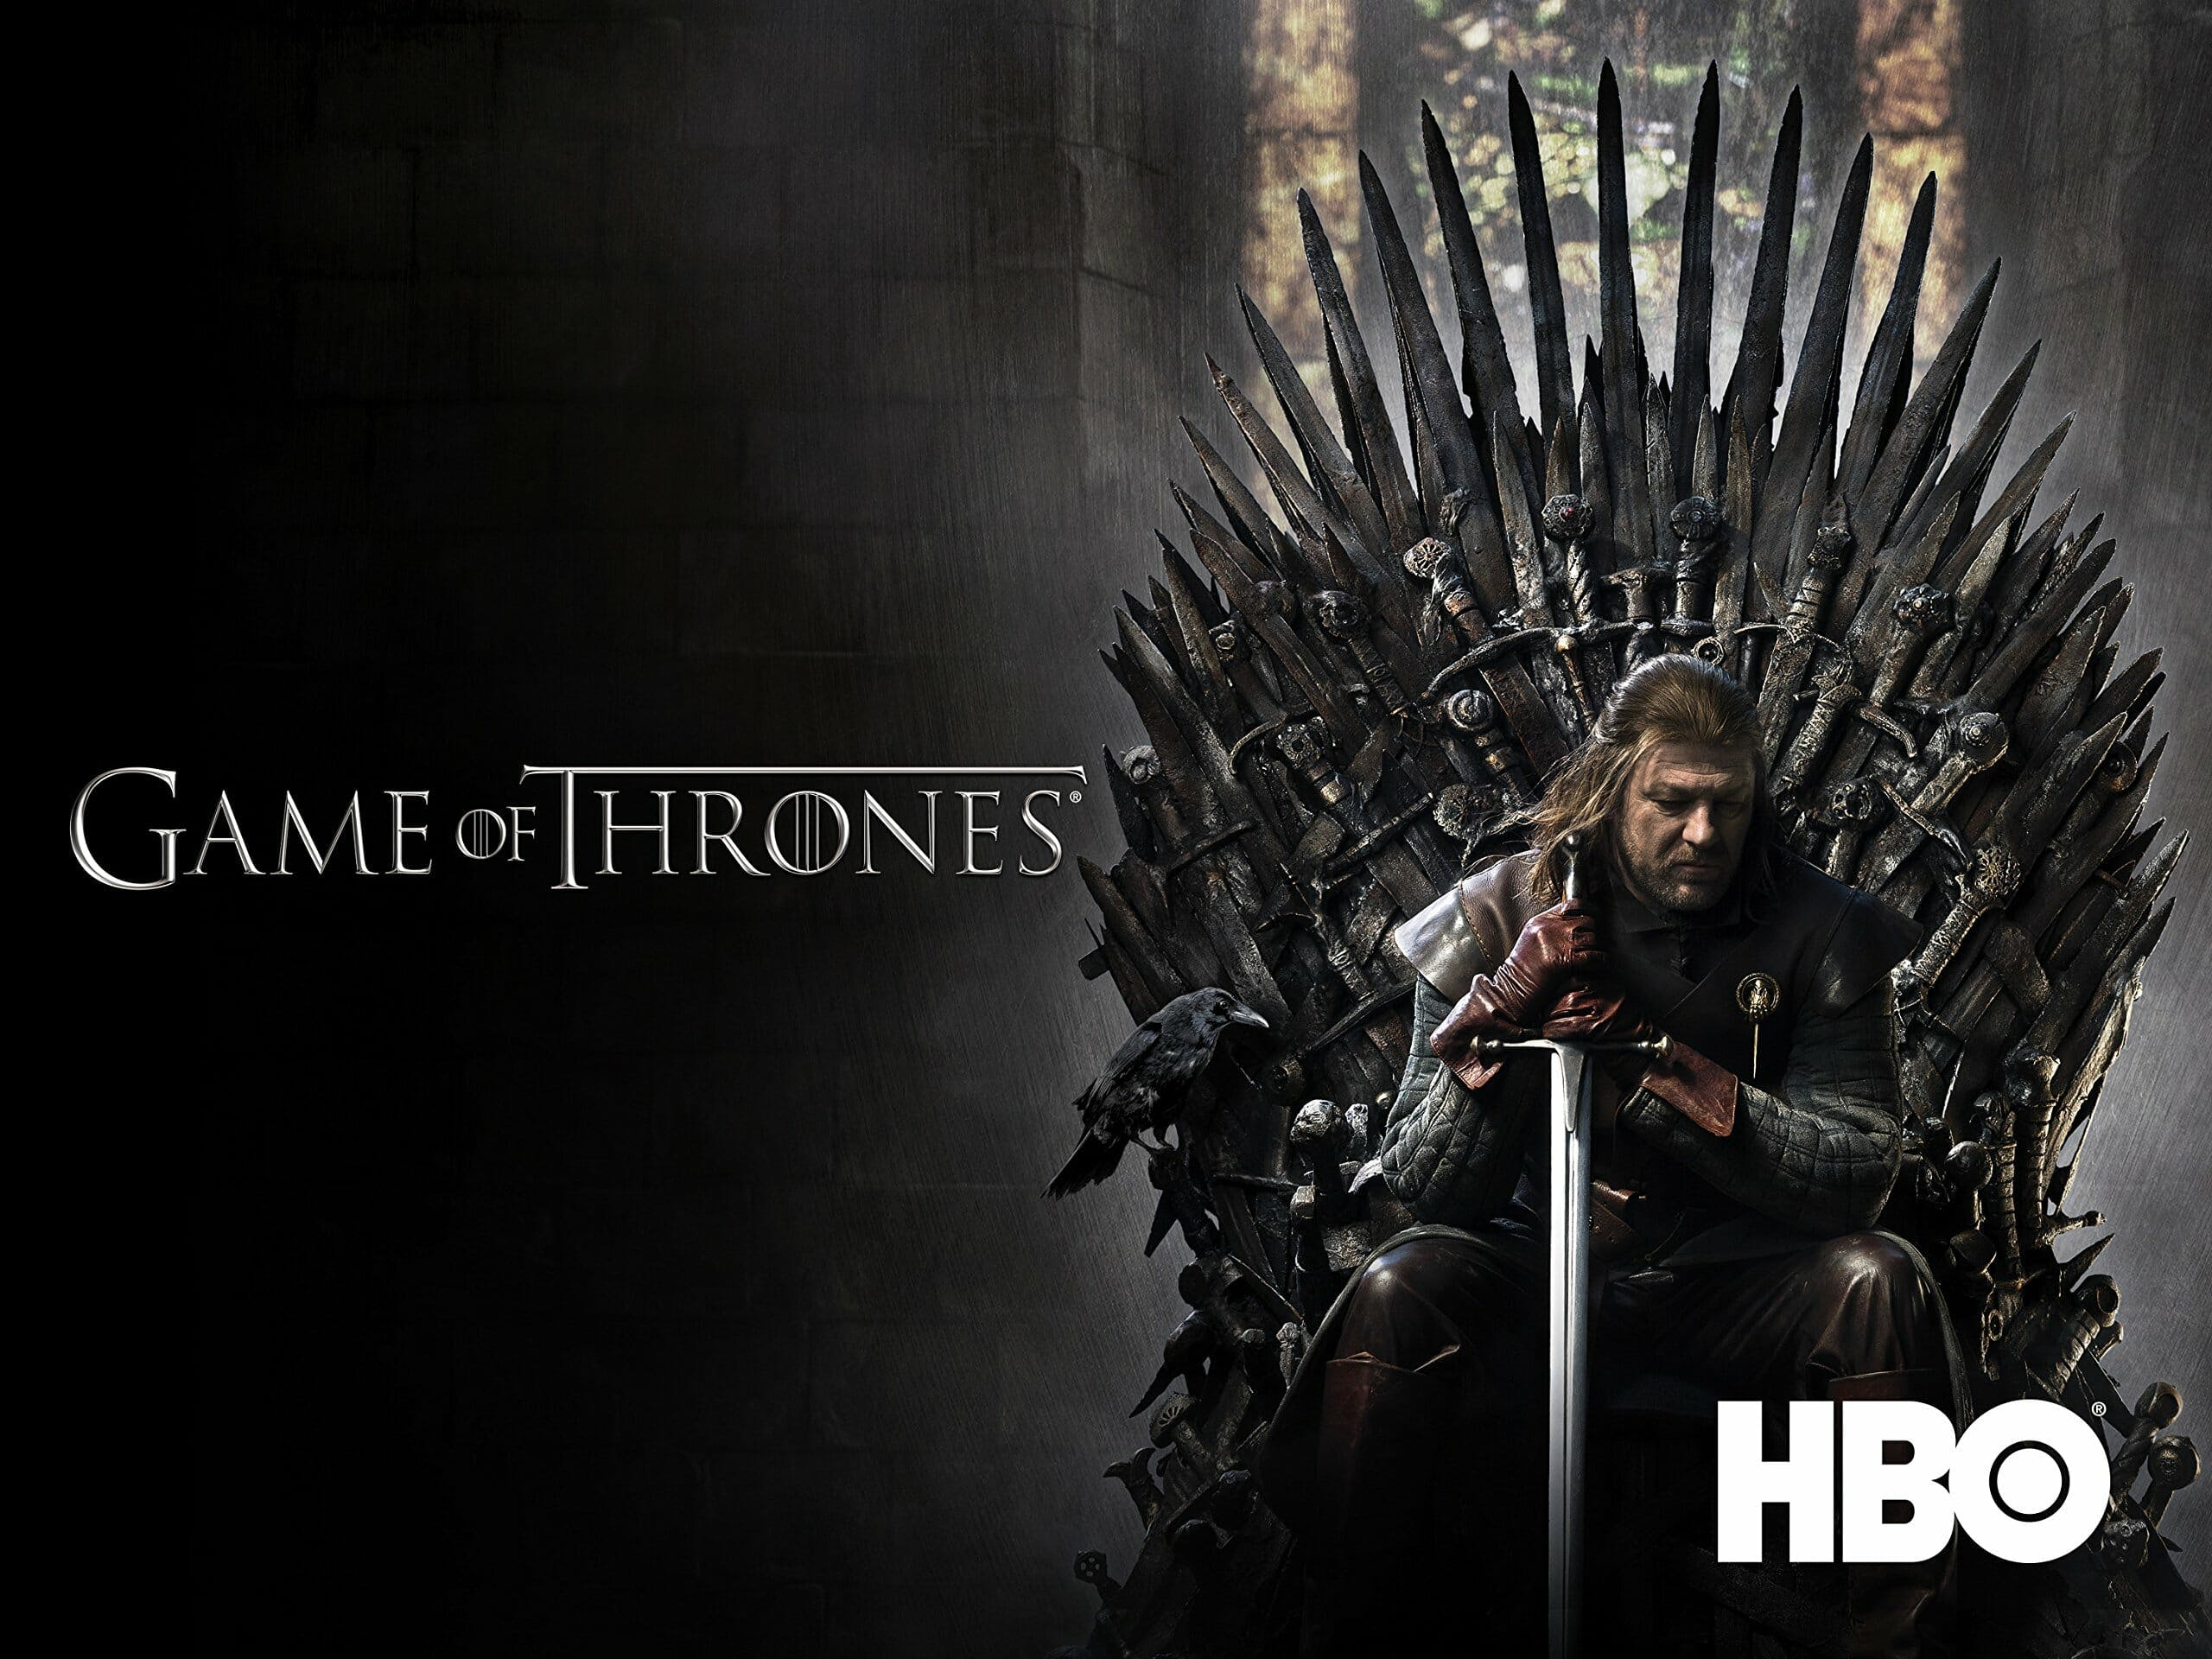 watch game of thrones season 8 episode 5 free on Amazon